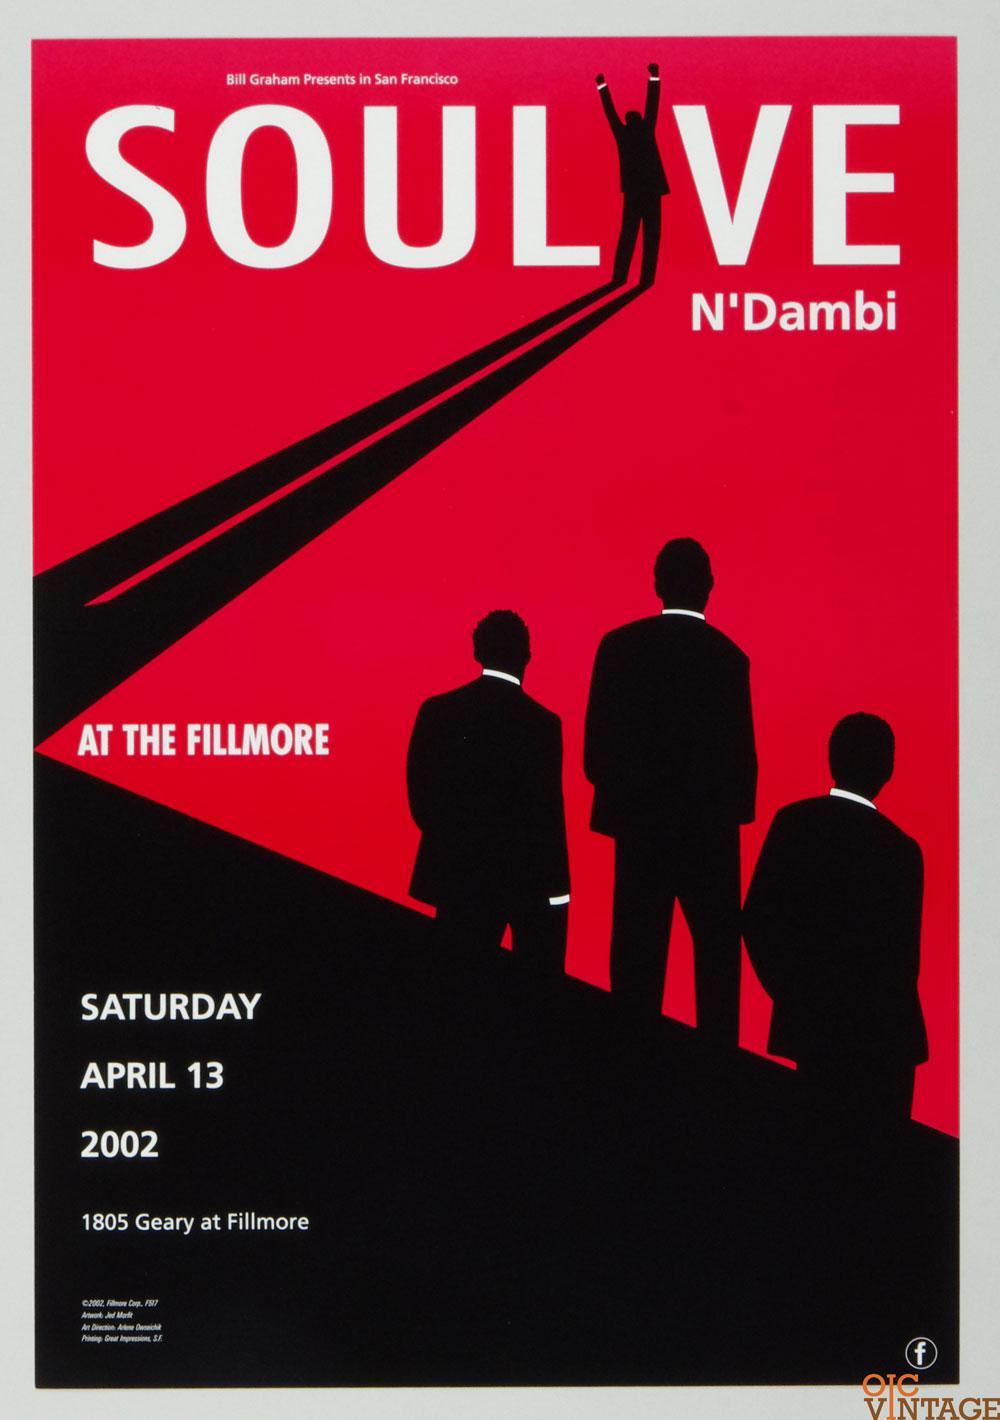 Soulove N'ambi Poster 2002 Apr 13 New Fillmore